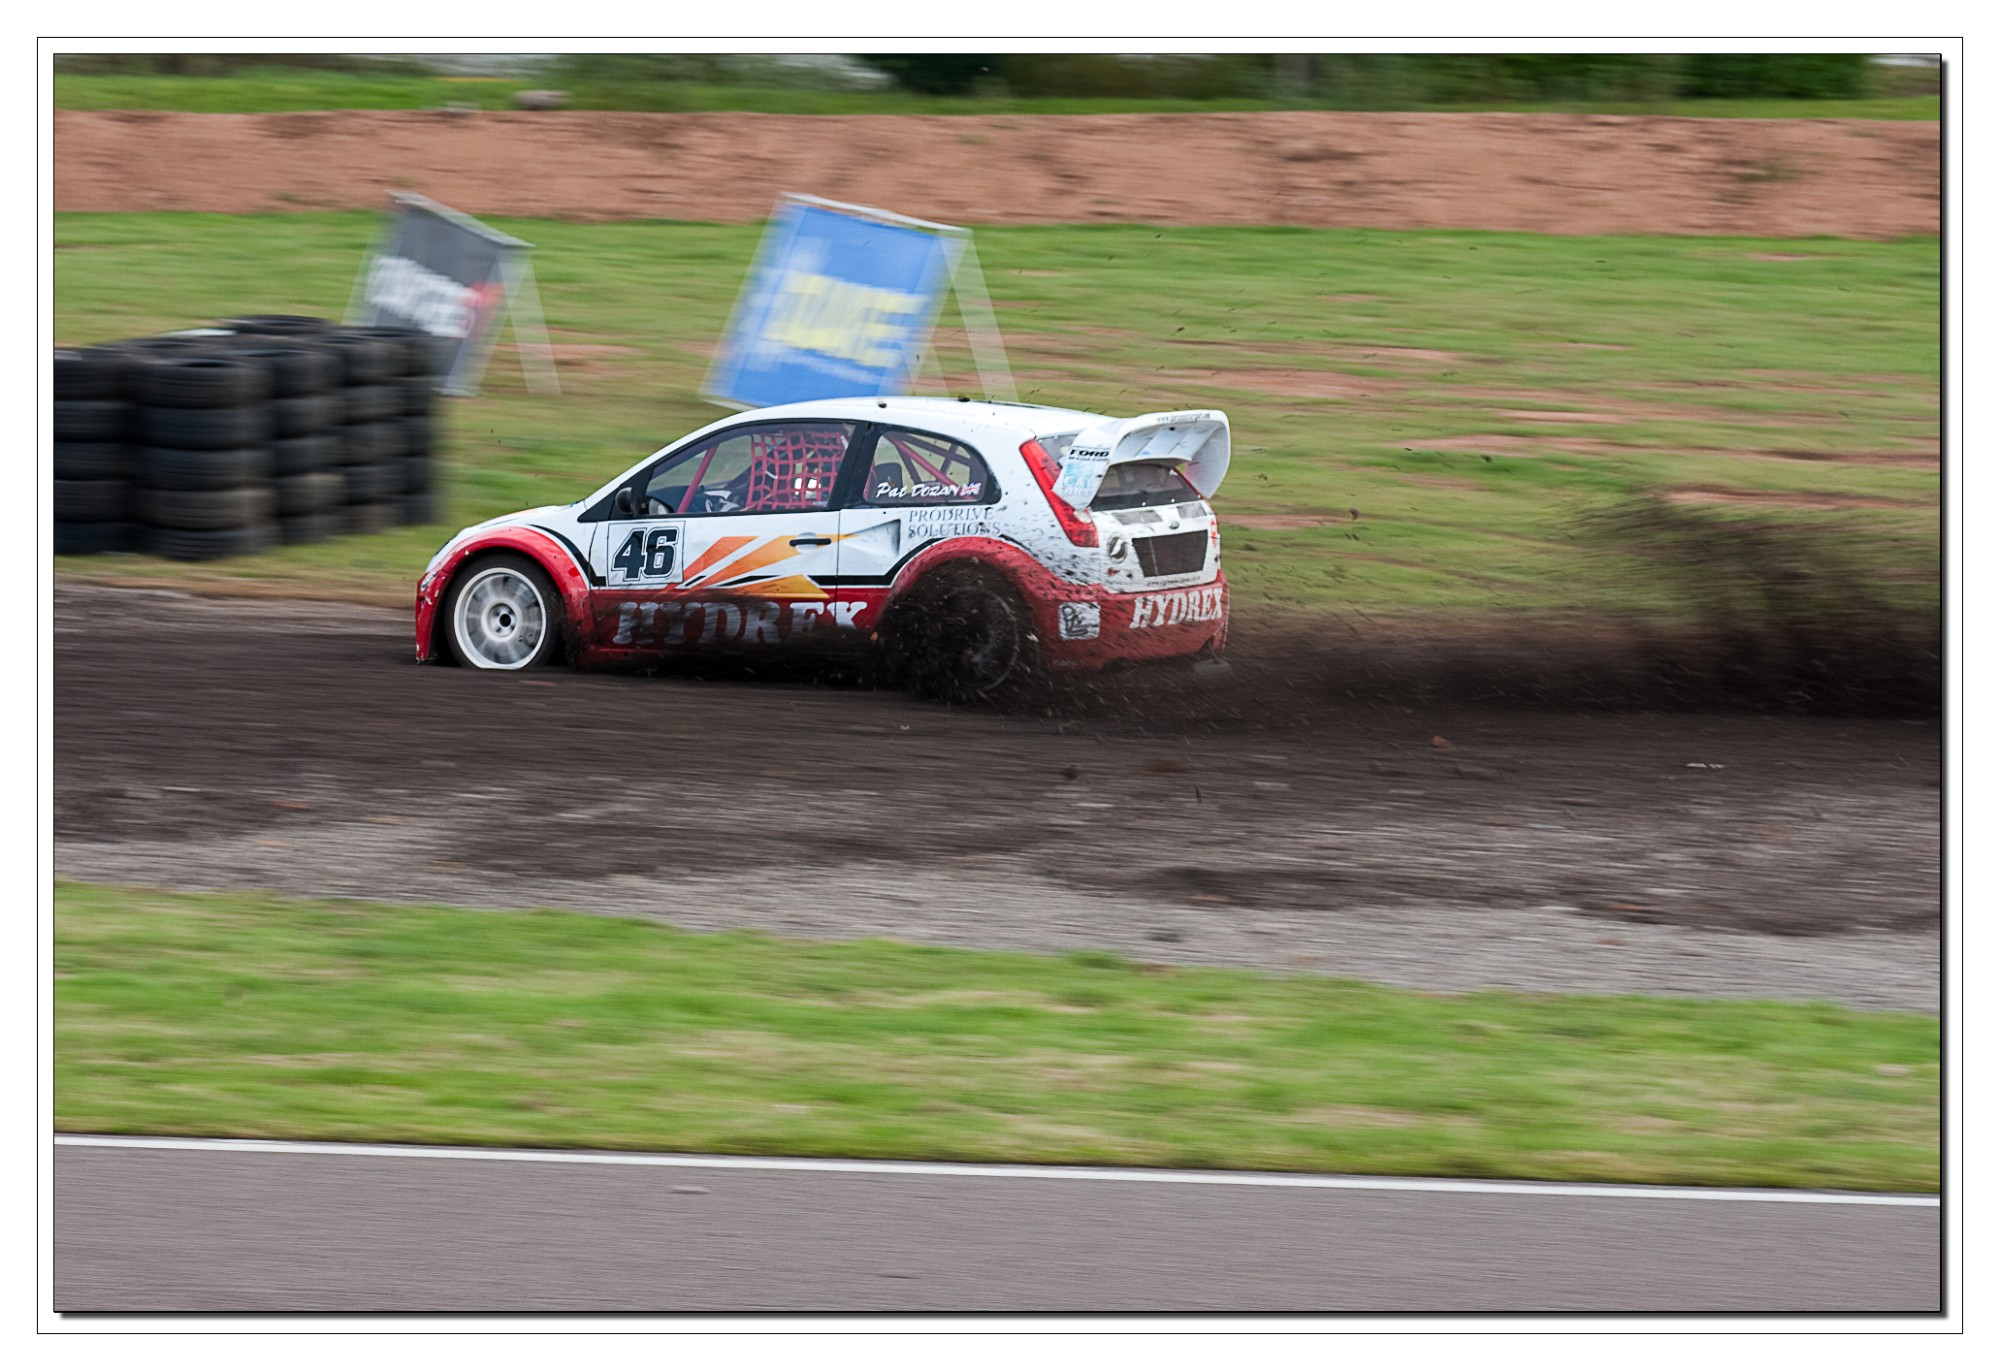 IMAGE: http://www.mark.colston-online.co.uk/Motorsport/Mallory%20Park/Rally%20Cross%202009/slides/IMG_5565%20EOS-1D%20Mark%20III%20copy.jpg